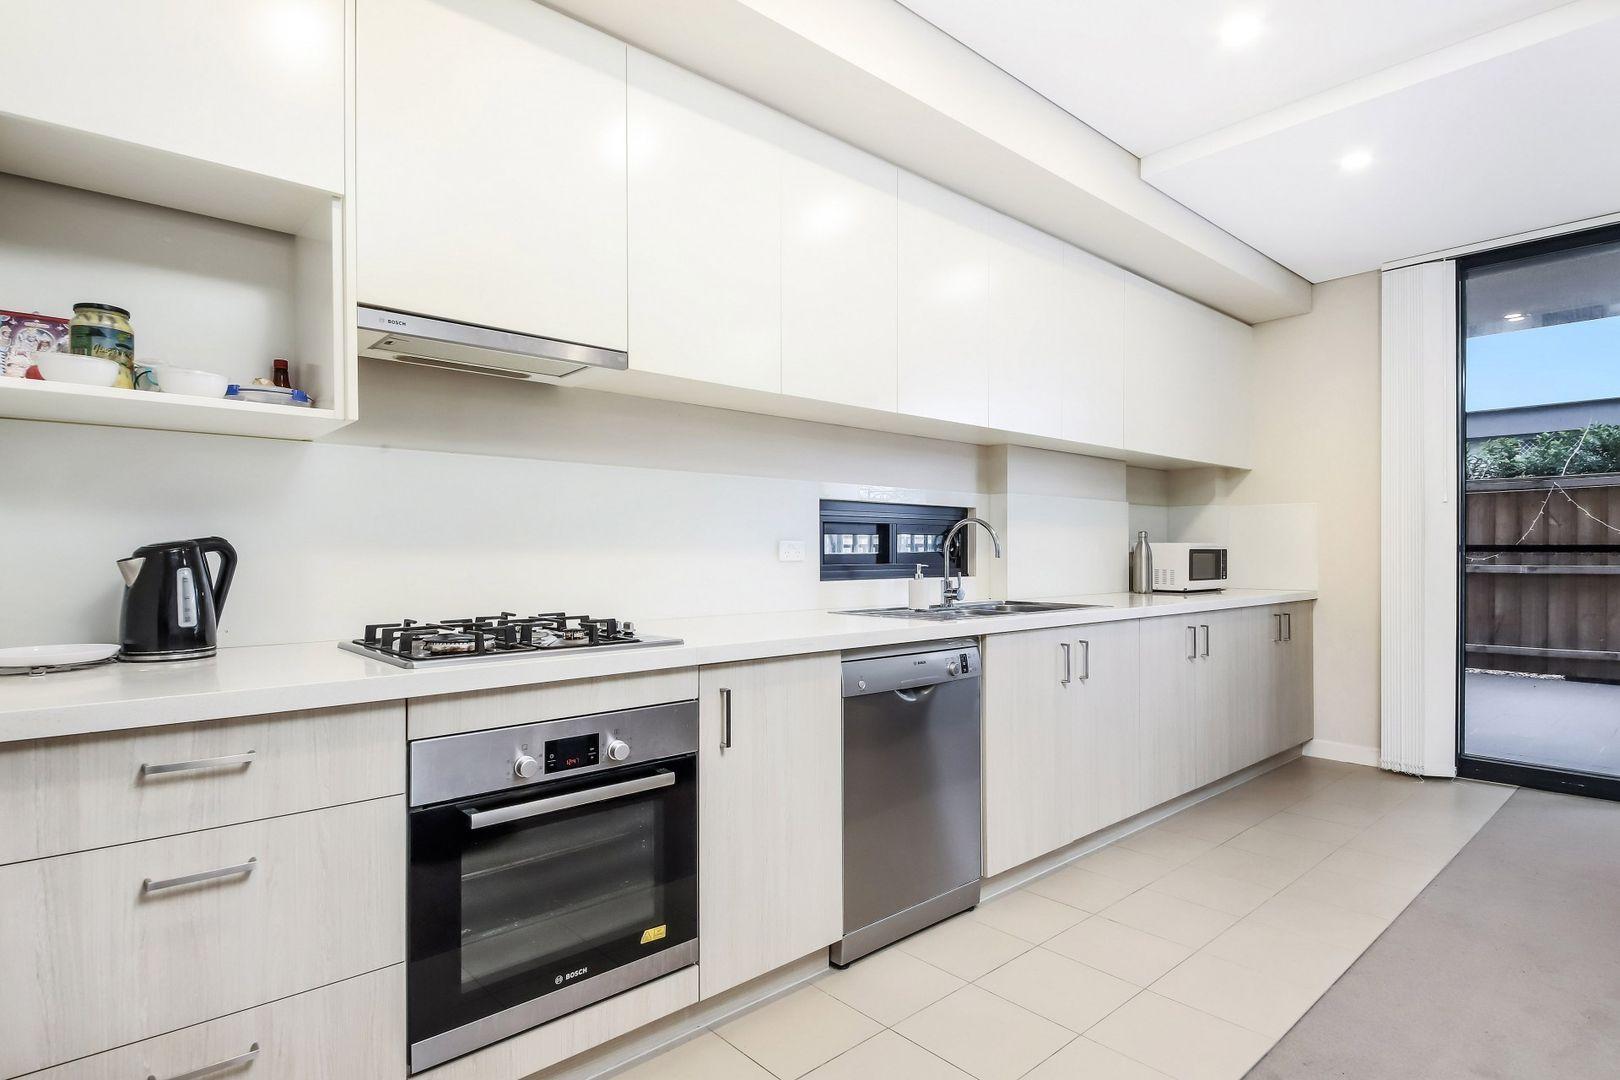 8/40-44 Edgeworth David Avenue, Waitara NSW 2077, Image 1